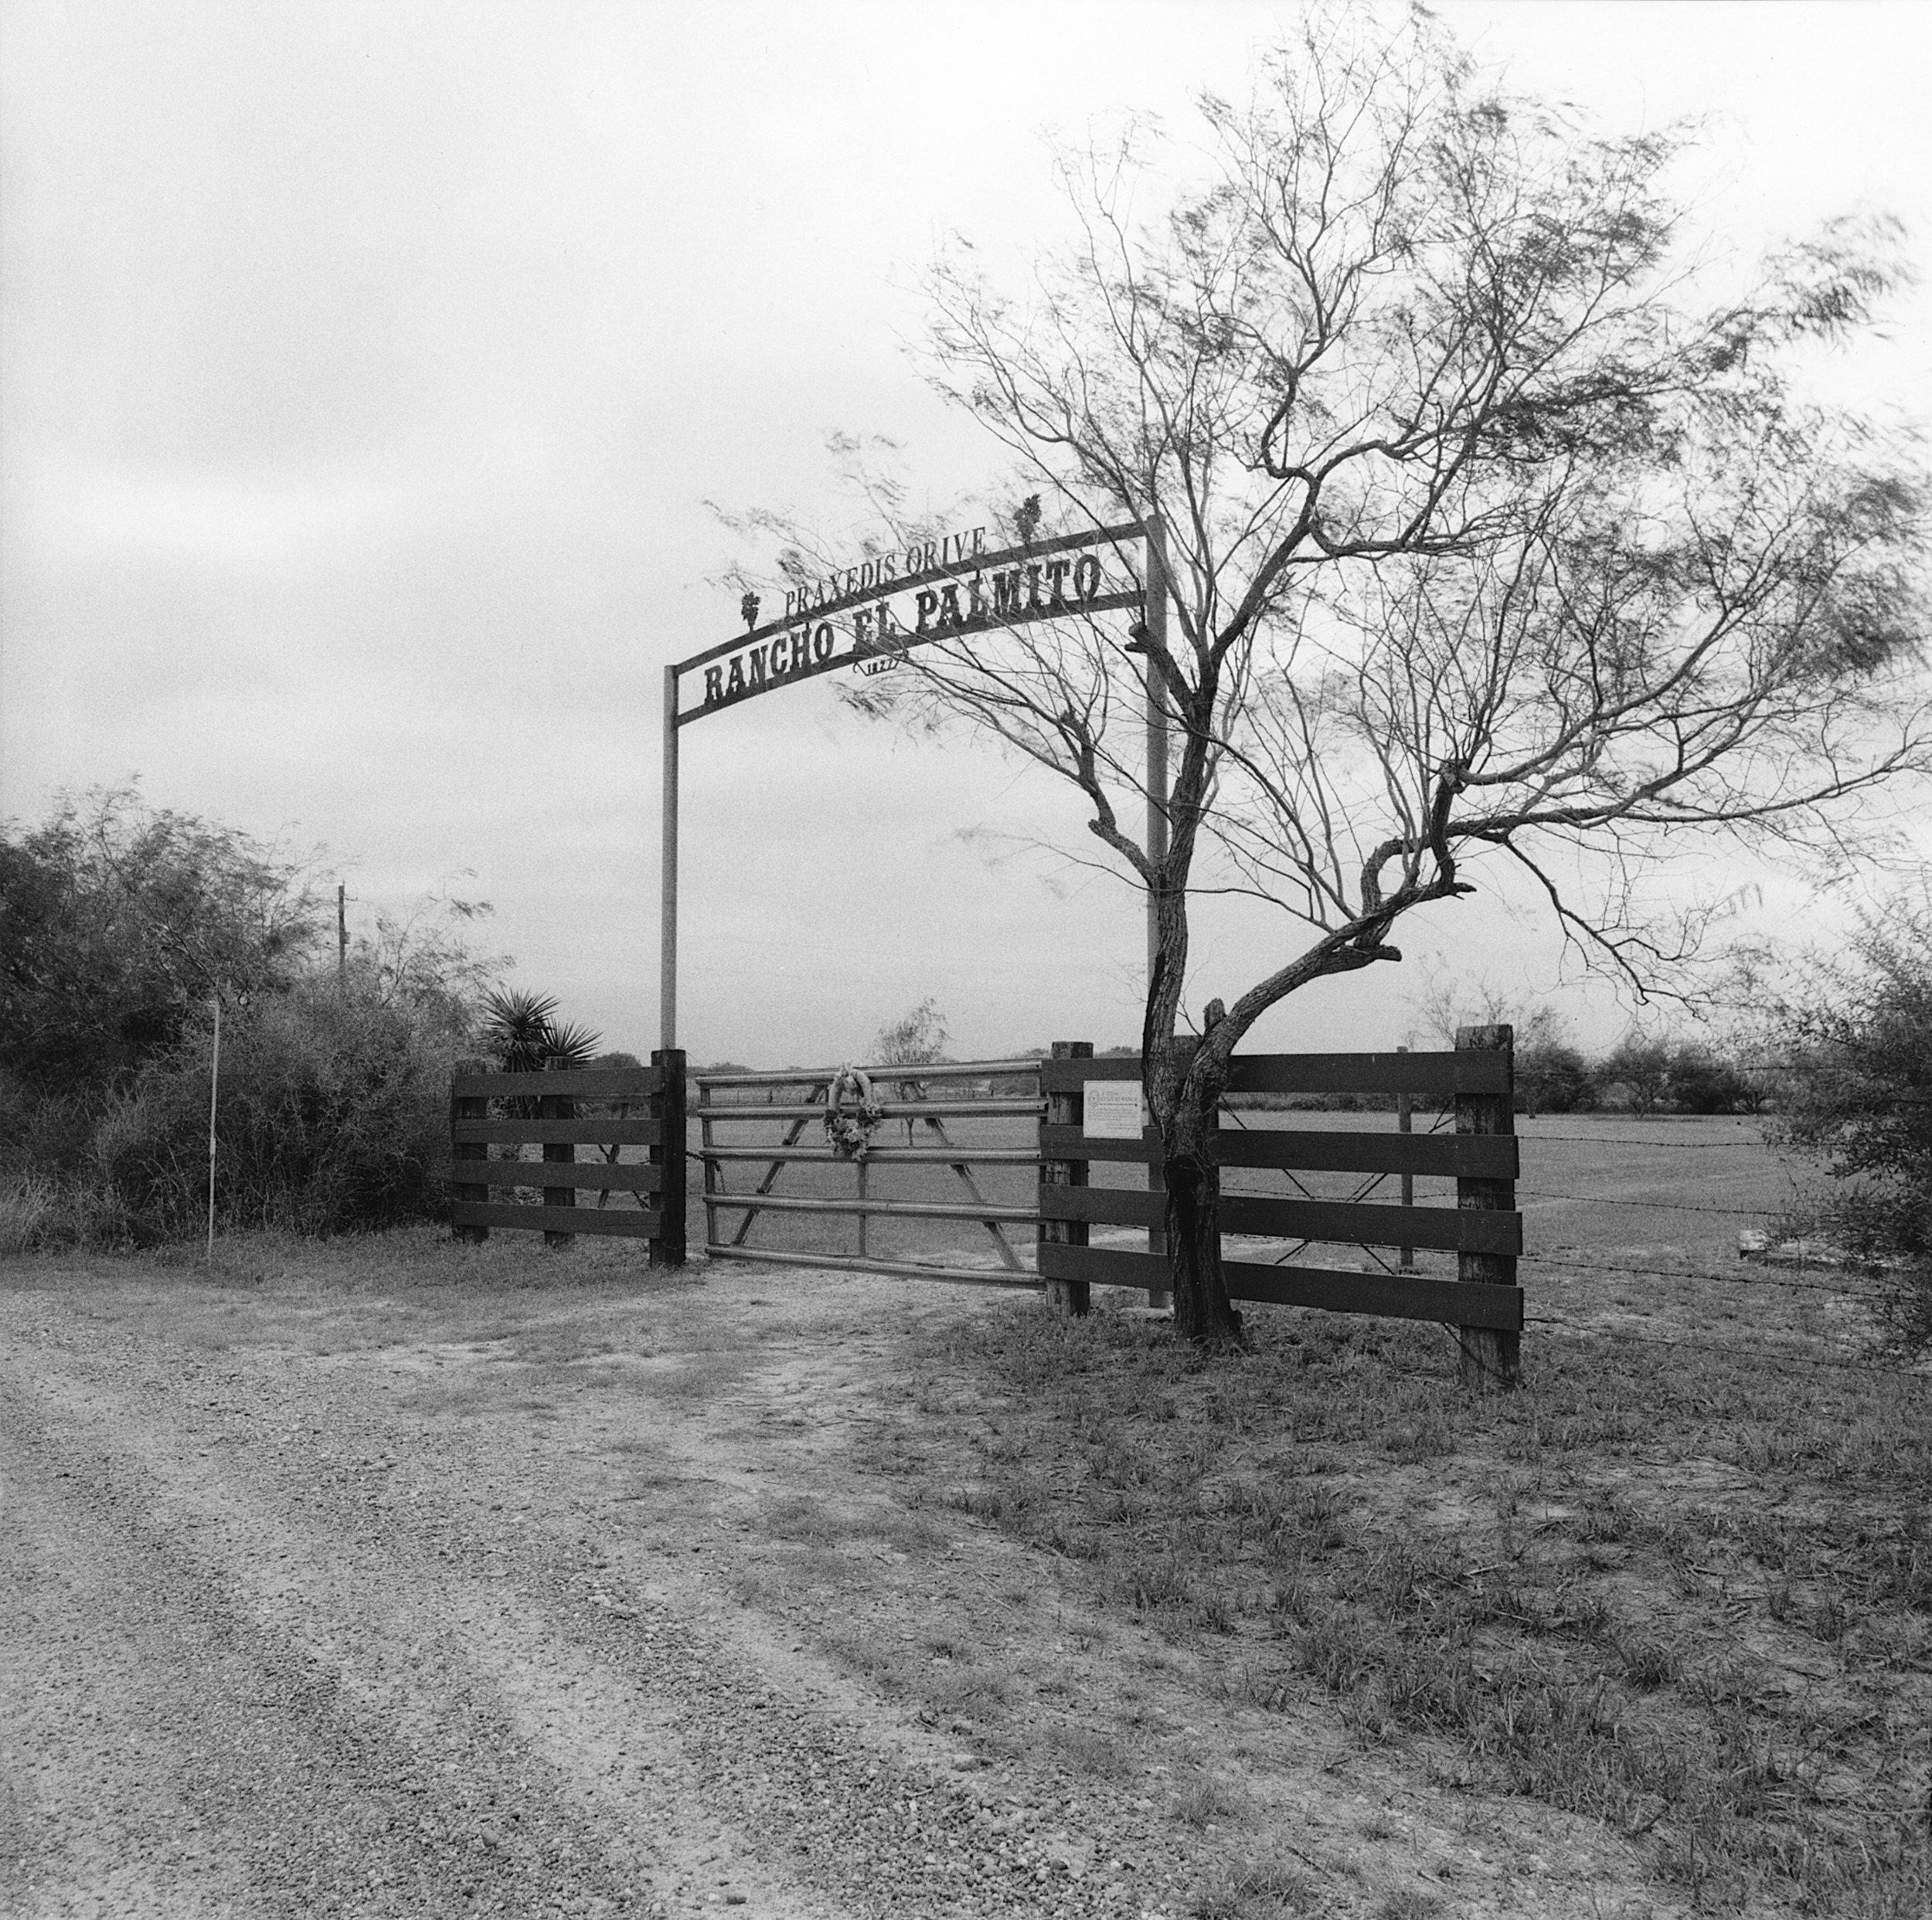 Palmetto Ranch Gate, Texas, 2001